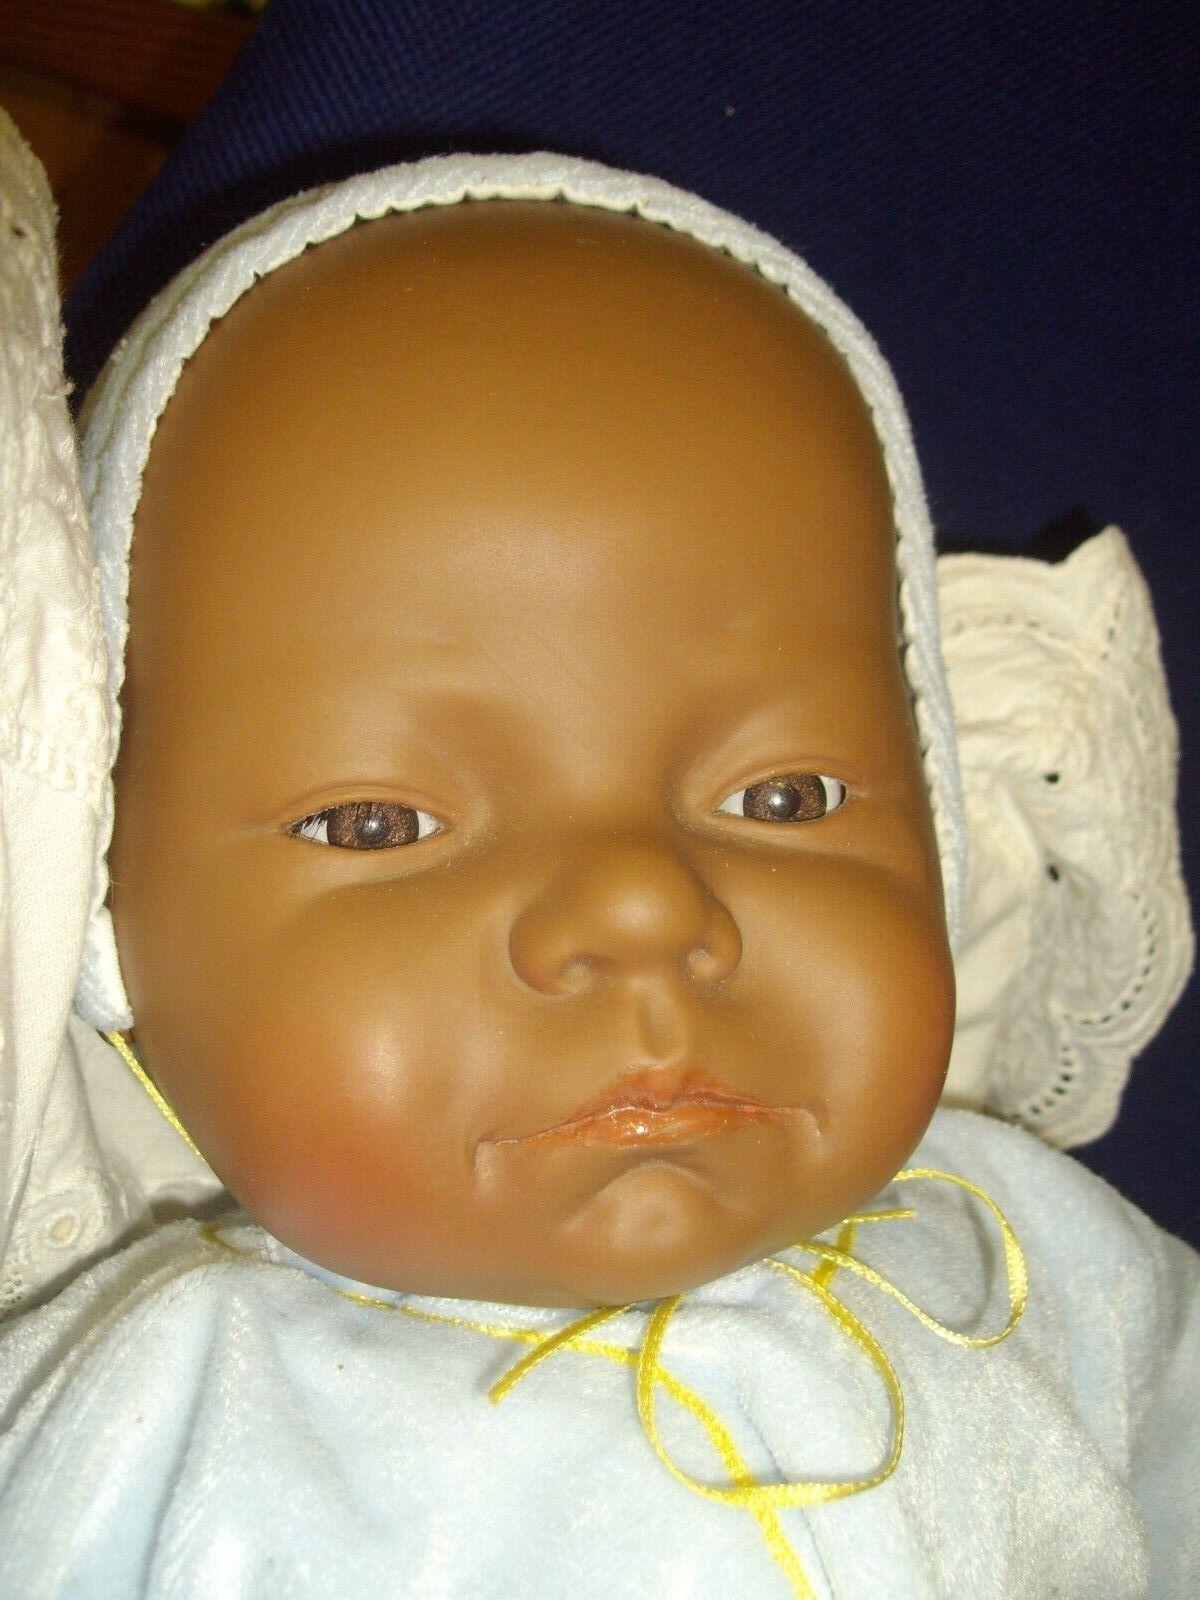 Niedlicher Schokokrümel - Puppe   Baby dunkel  Antonio Juan ca 52 cm